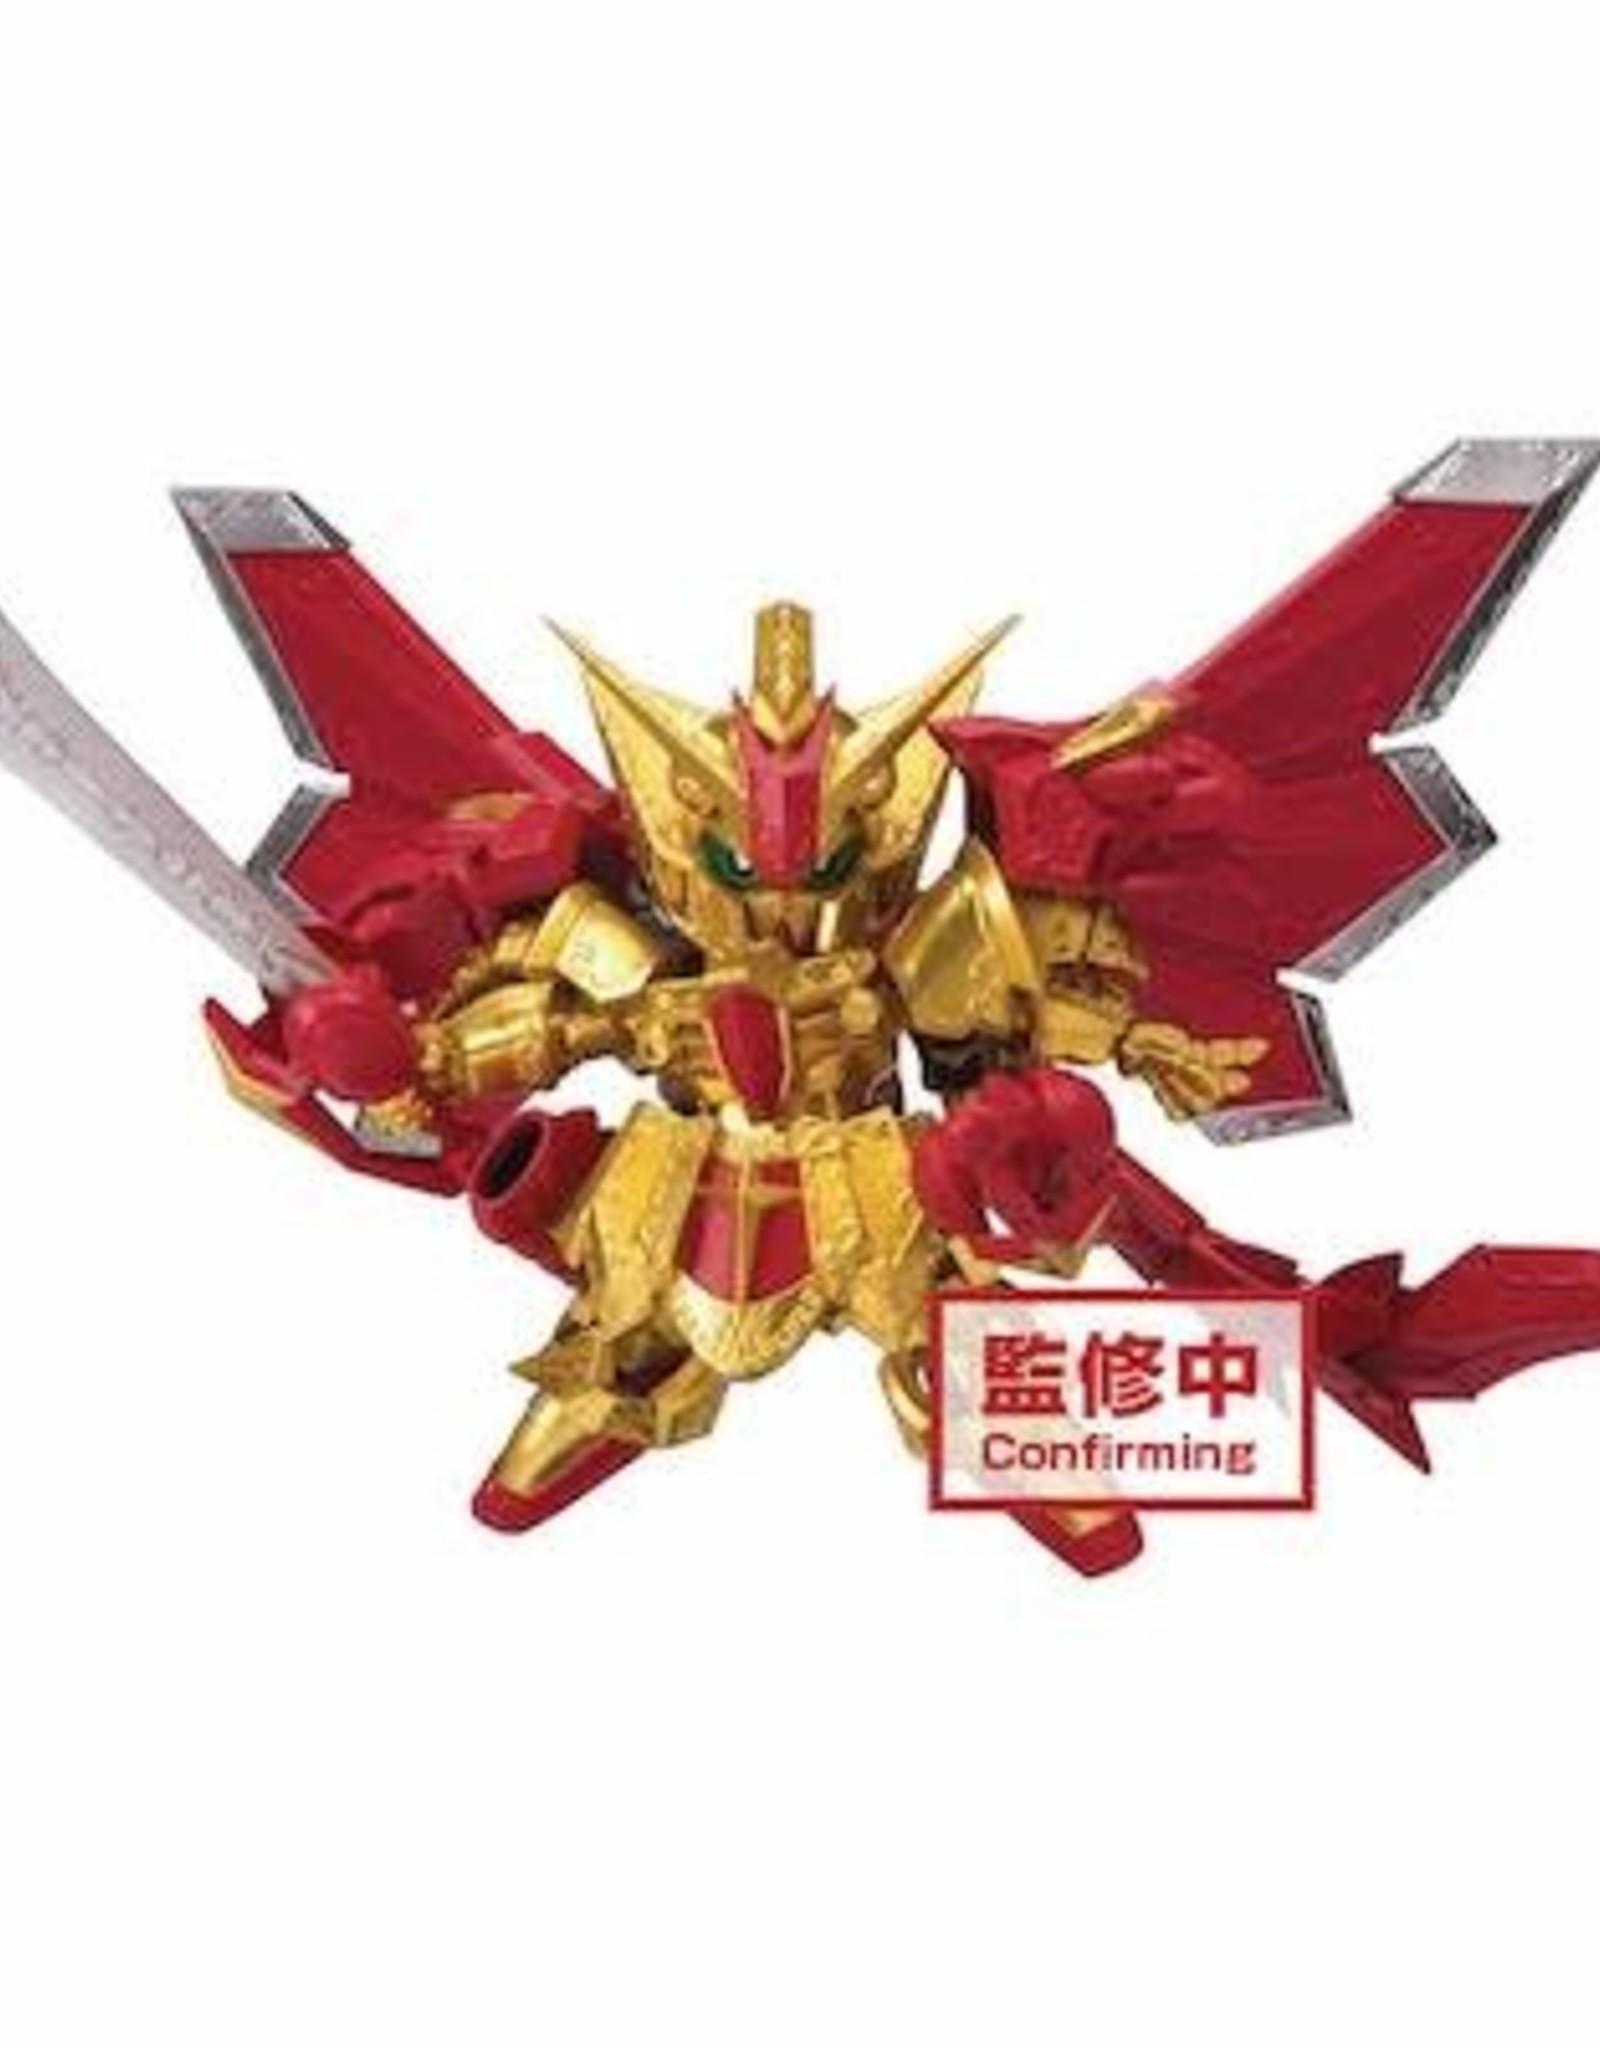 Banpresto SD Gundam Superior Dragon Knight of Light Figure